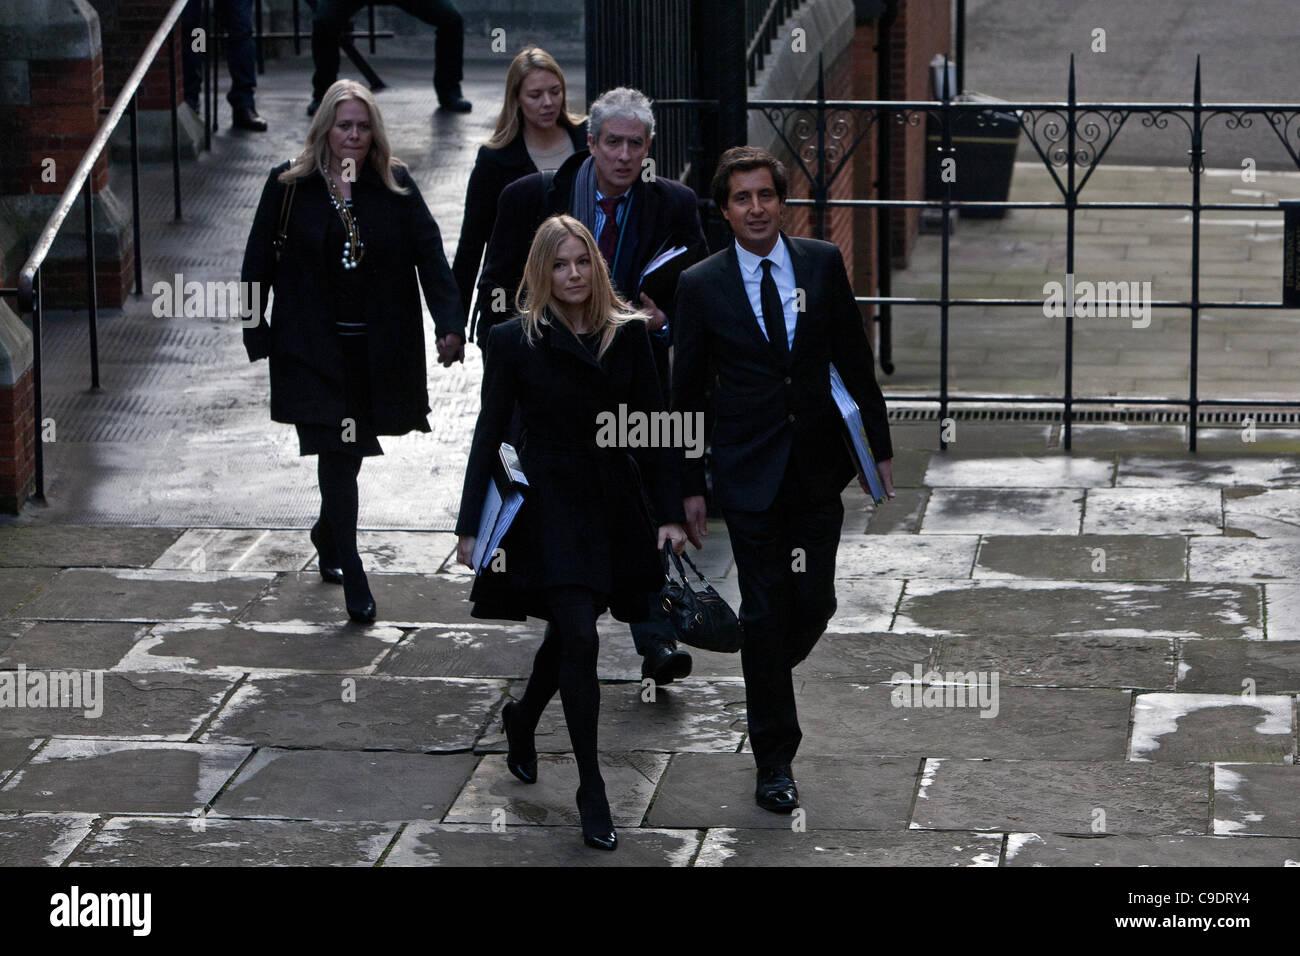 London, UK, 24/11/2011. NOTW Phone hacking victim, actress Sienna Miller ex girlfriend of actor Jude Law, arriving - Stock Image